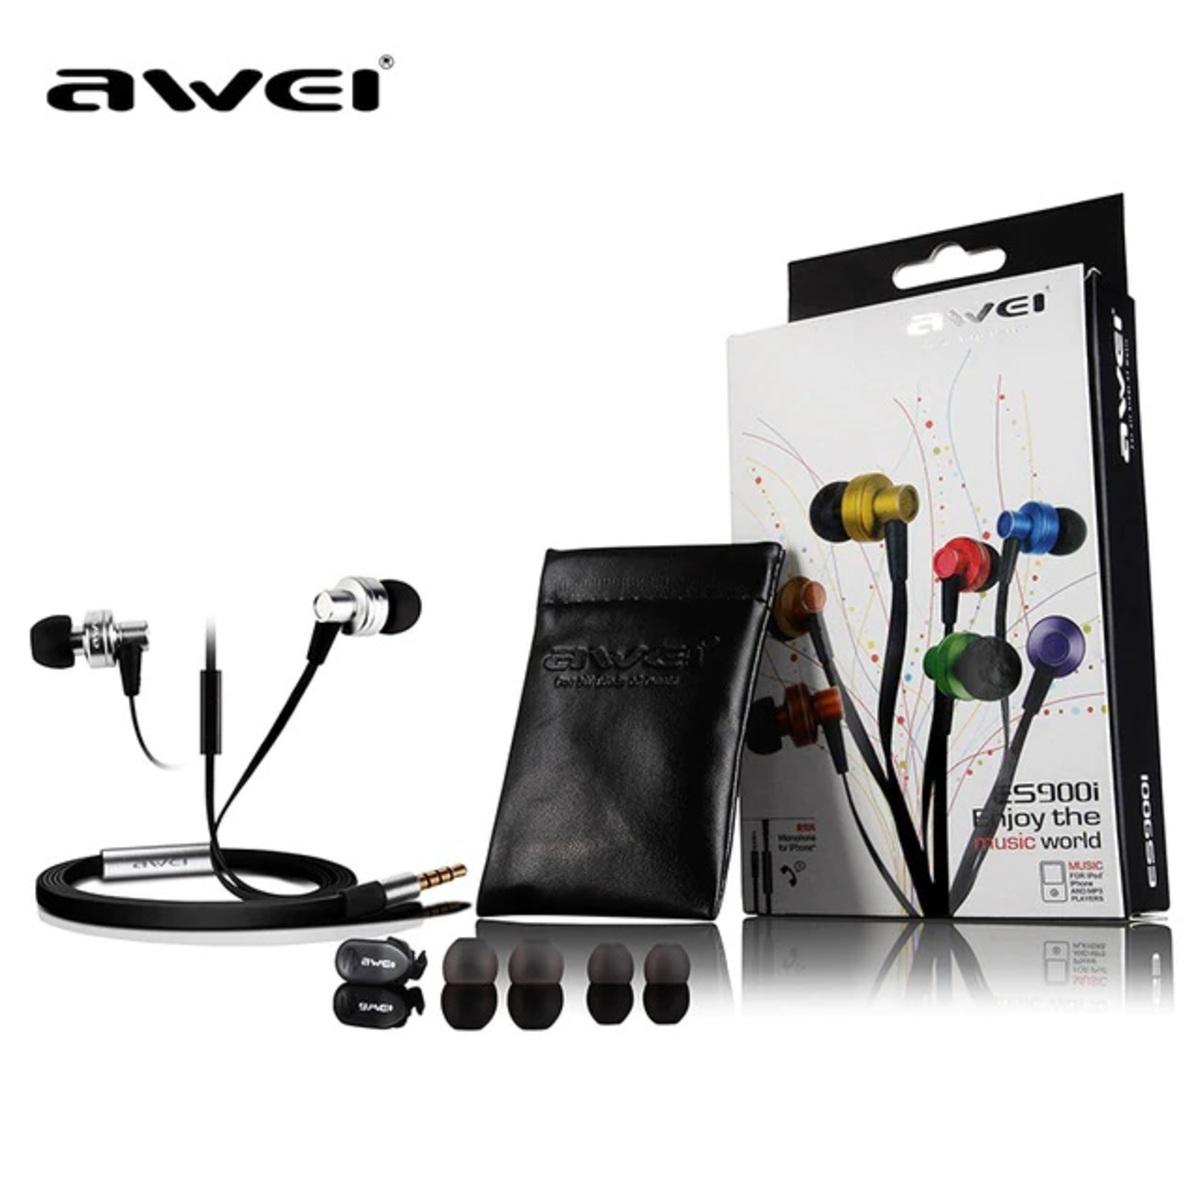 (ES-900I) In-ear Wire Control Earphone Dual Dynamic Units Earbuds-Black